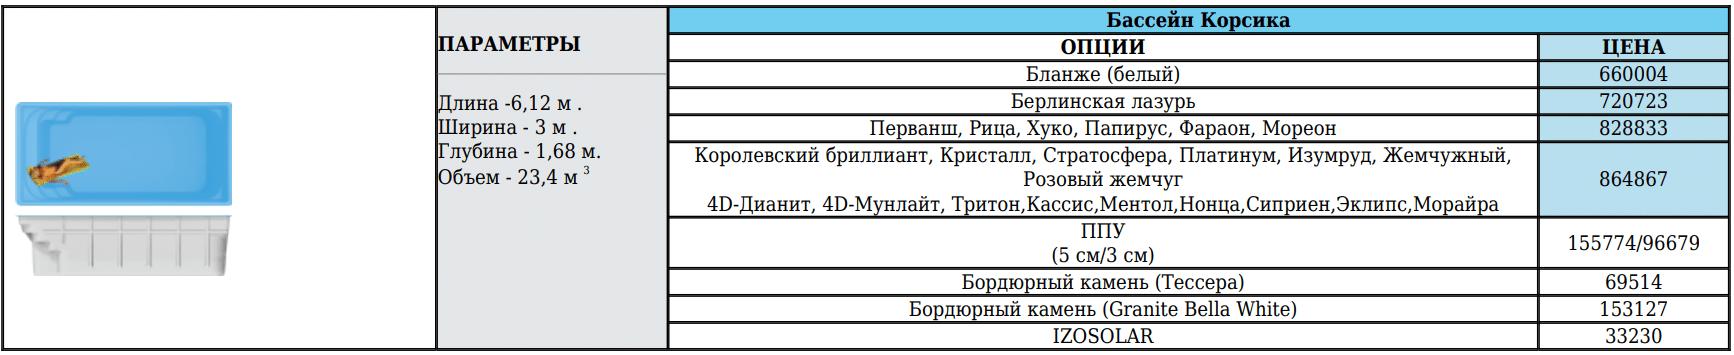 Композитный бассейн КОРСИКА Prime (белый) - фото pic_fa3a48dadf52f5ccd2846130e74e5689_1920x9000_1.png